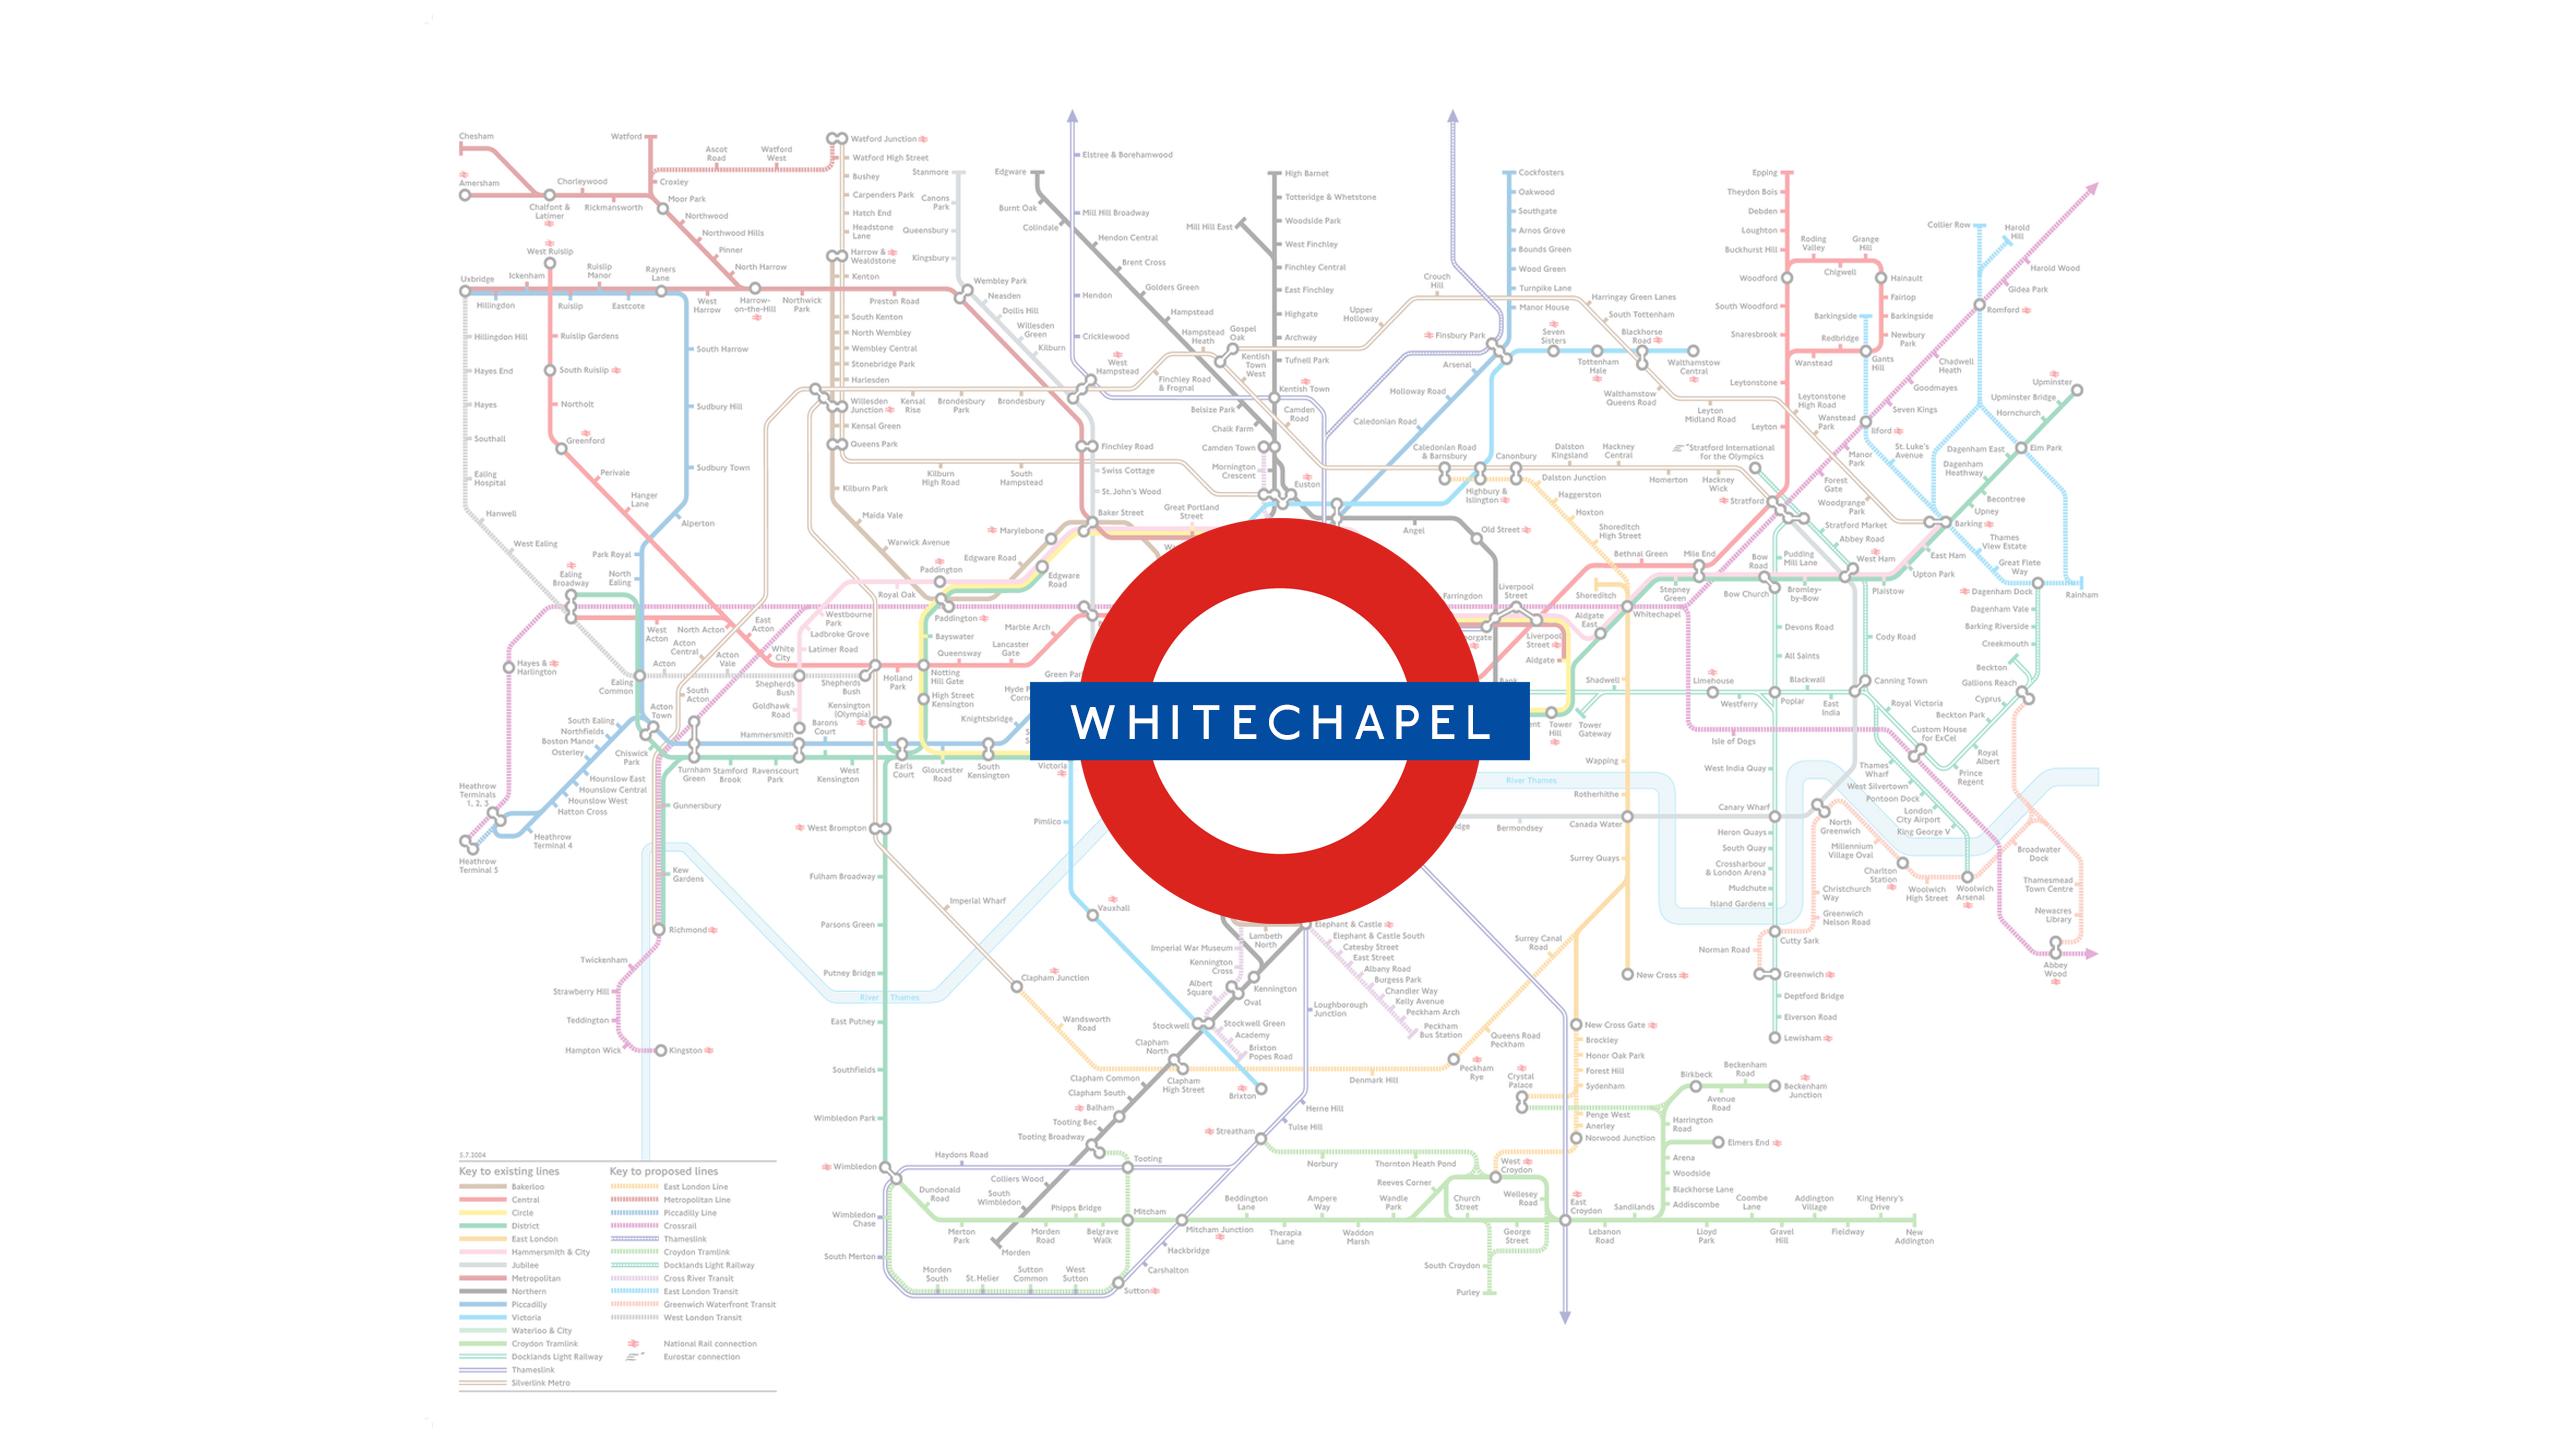 Whitechapel (Map)